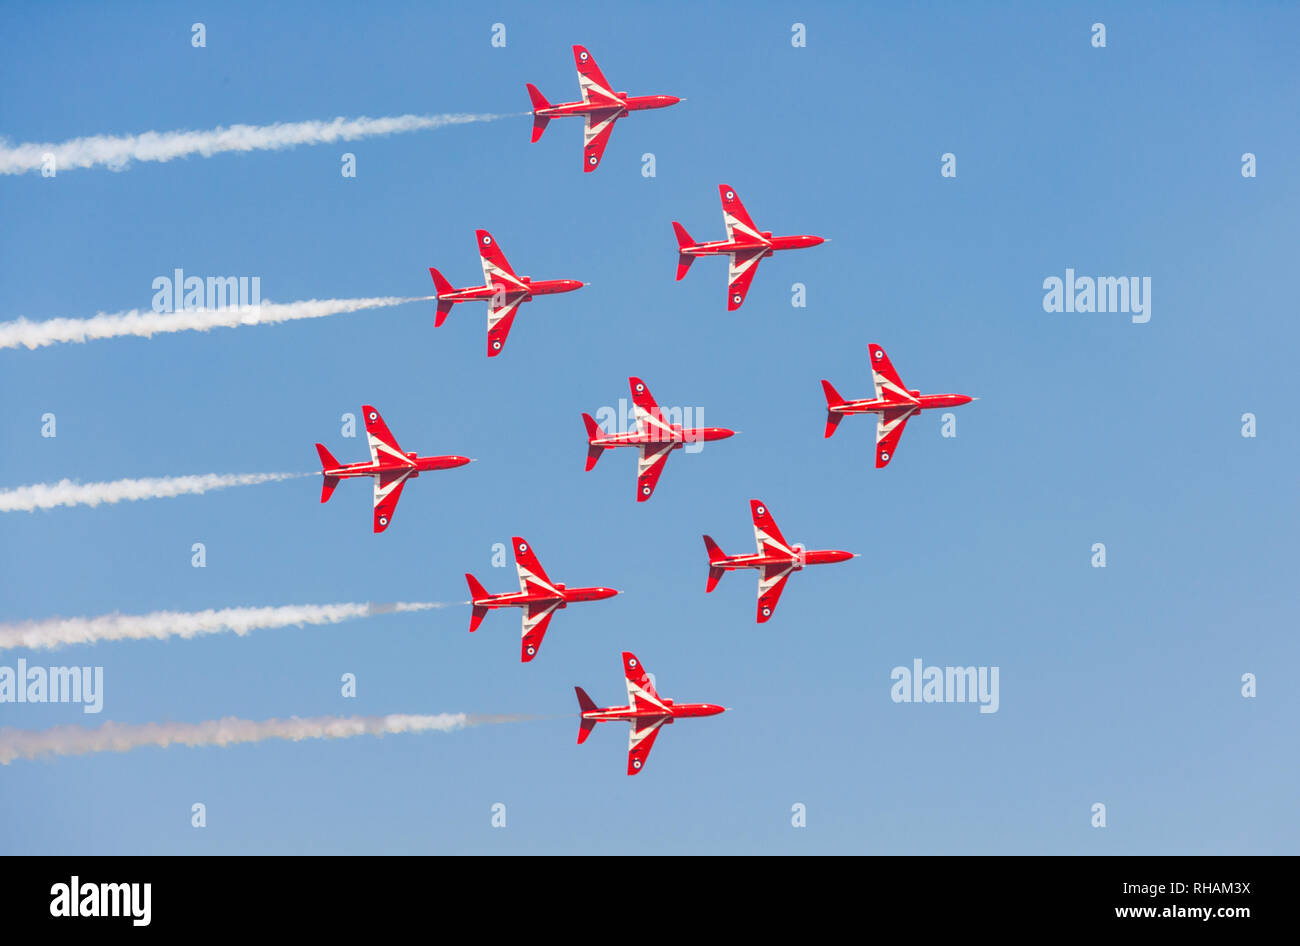 DUBAI, UAE - NOVEMBER 11, 2007: The Royal Air Force's Red Arrows aerobatic team flying over Dubai in BAE Hawk aircraft. Stock Photo